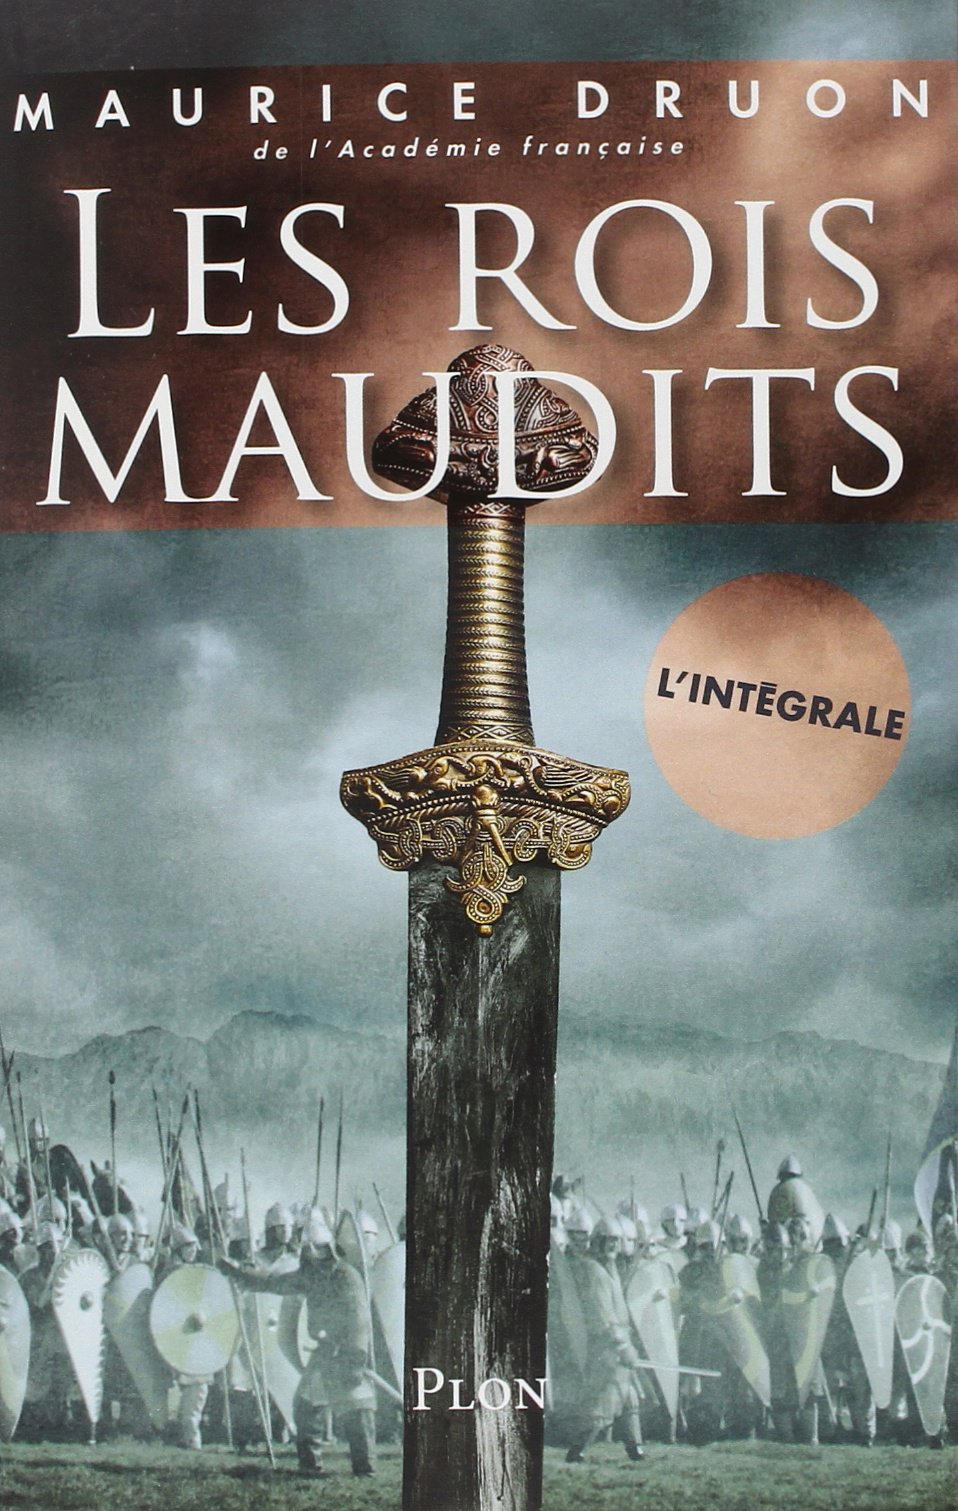 Maurice Druon - Les Rois Maudits : 7 Livres (Epub)